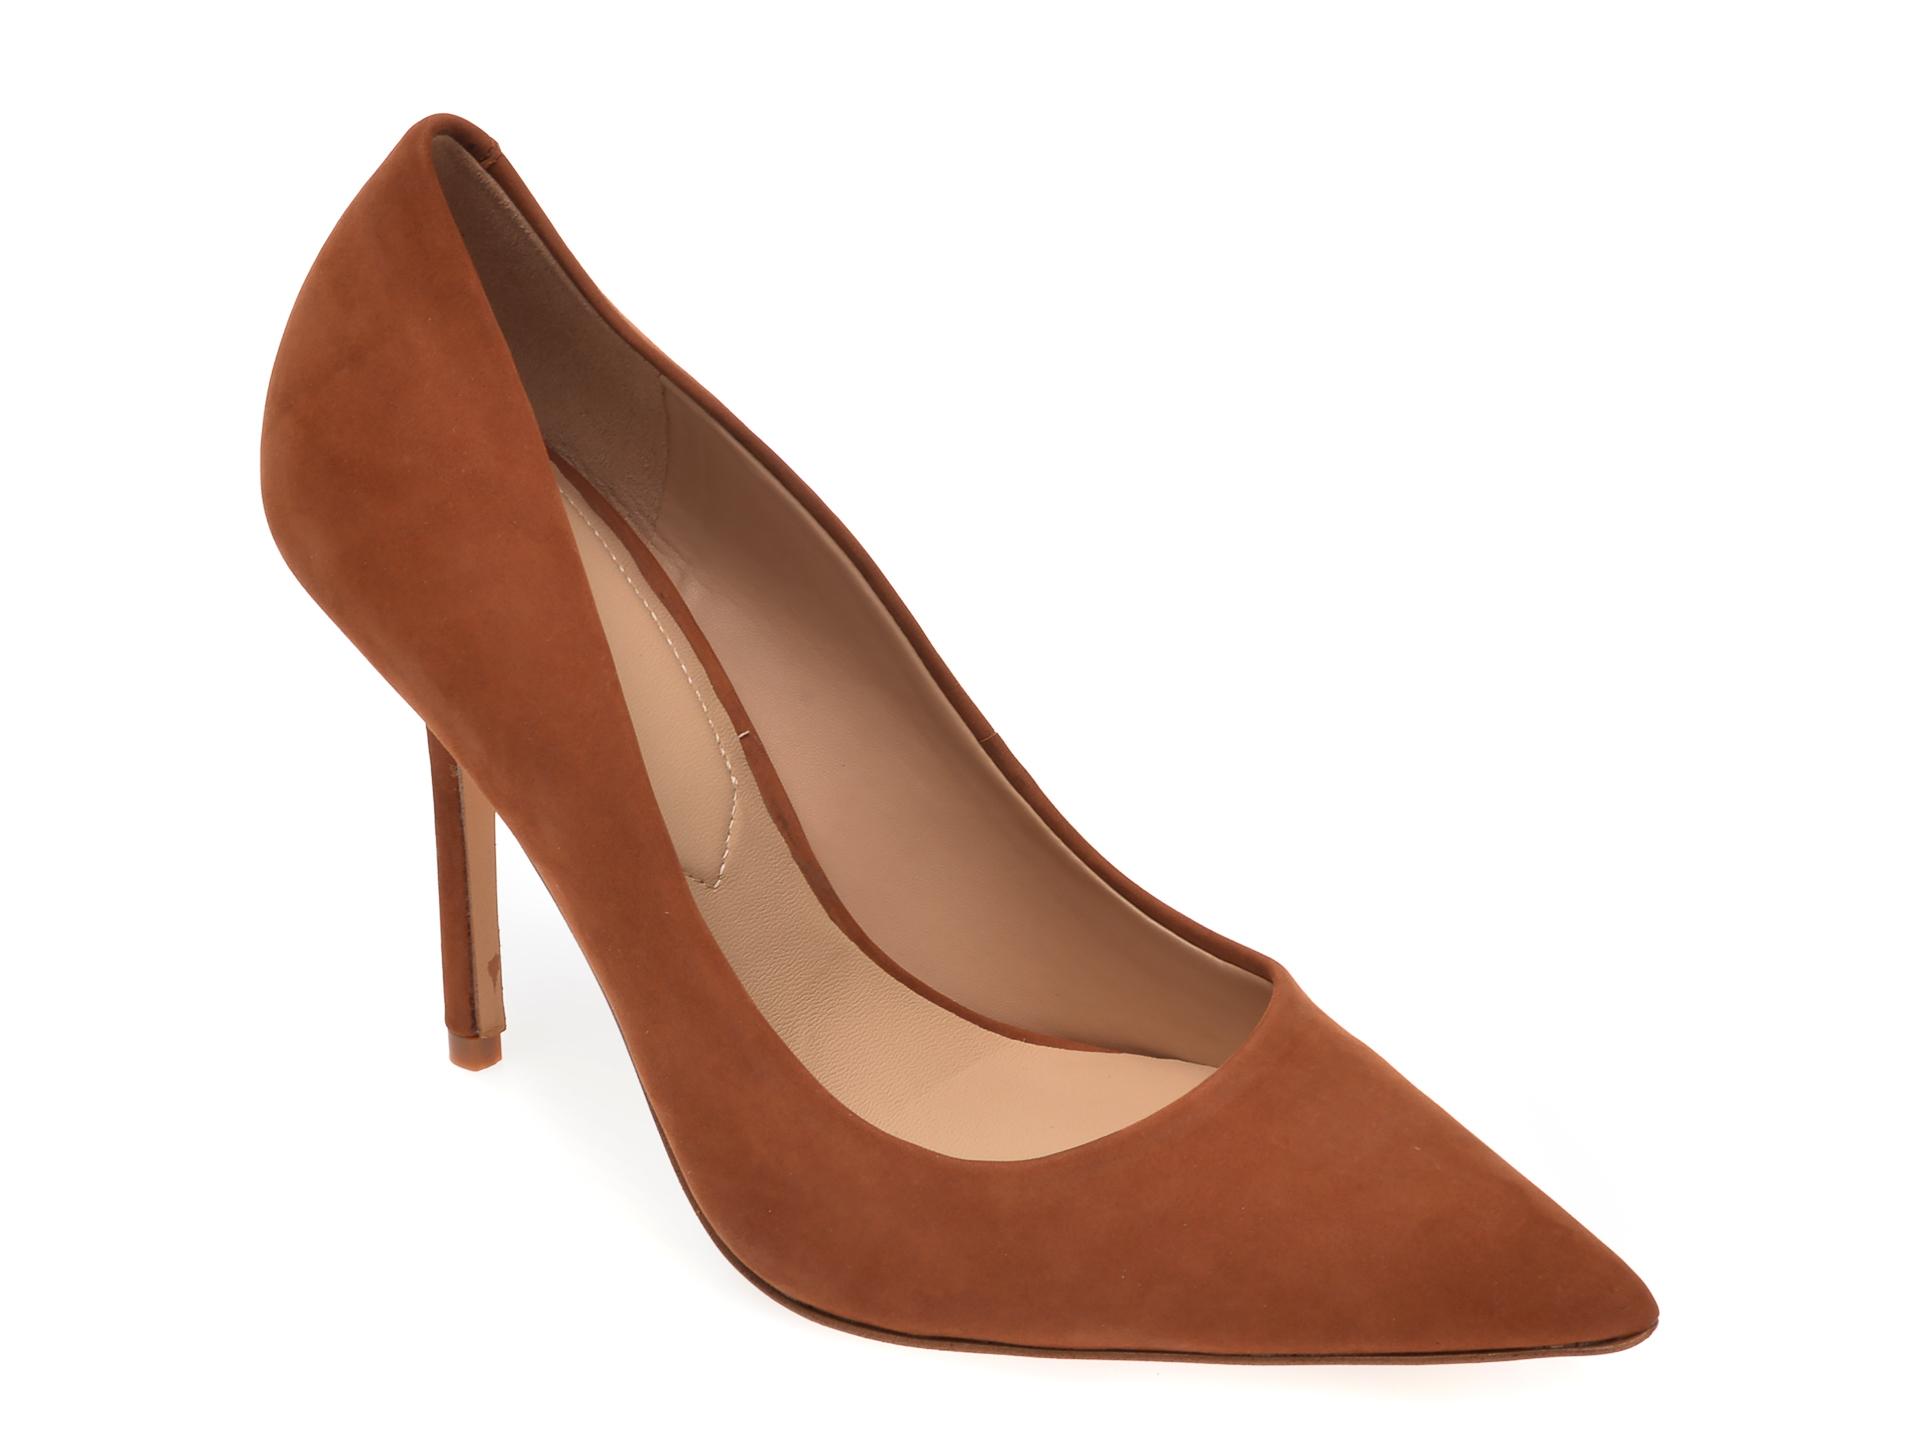 Pantofi ALDO maro, Sophy230, din nabuc